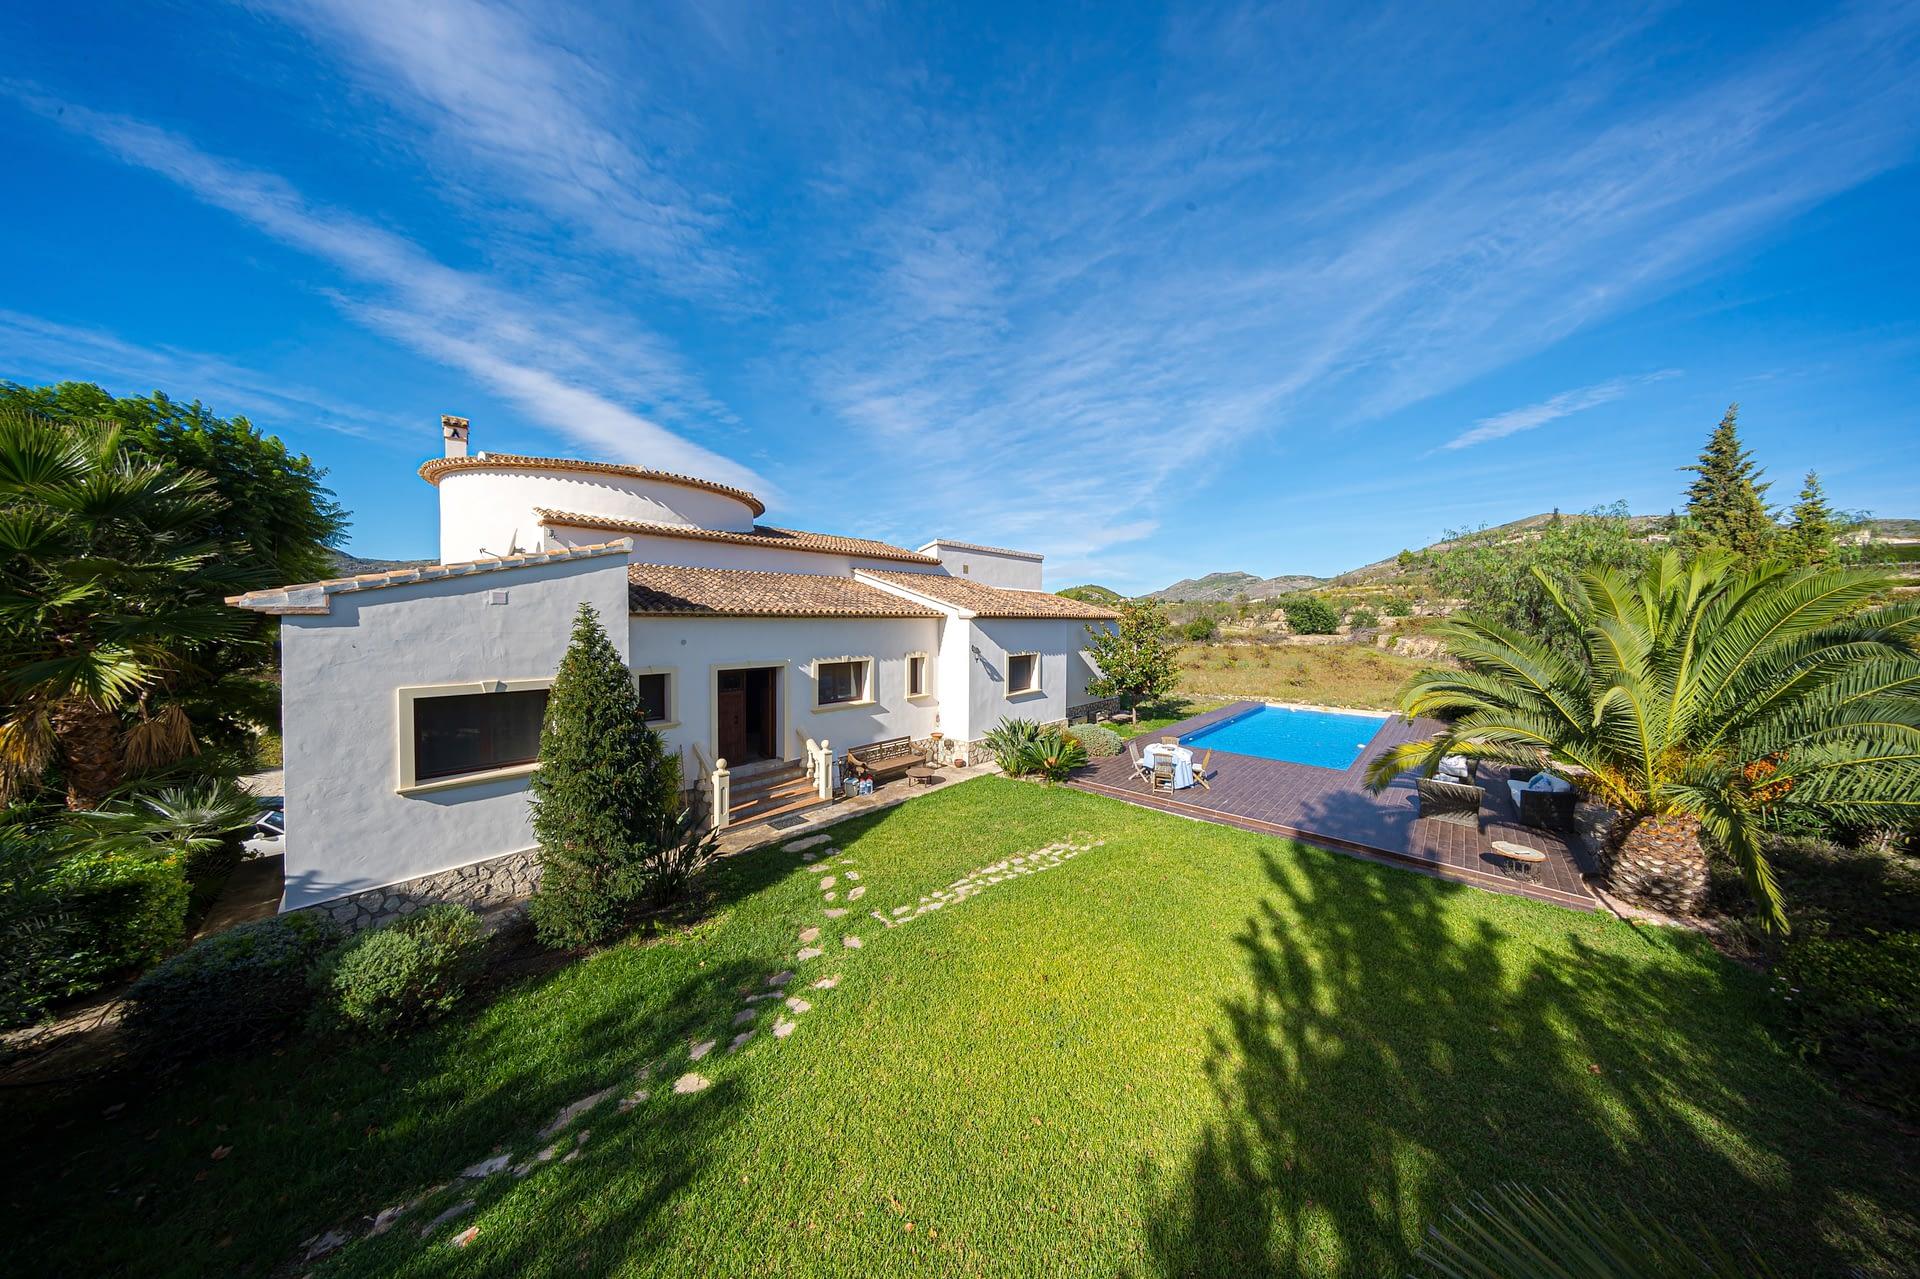 Pierluigi Cavarra - fotografo de Inmobiliaria - real estate photography costa blanca - ejemplo11